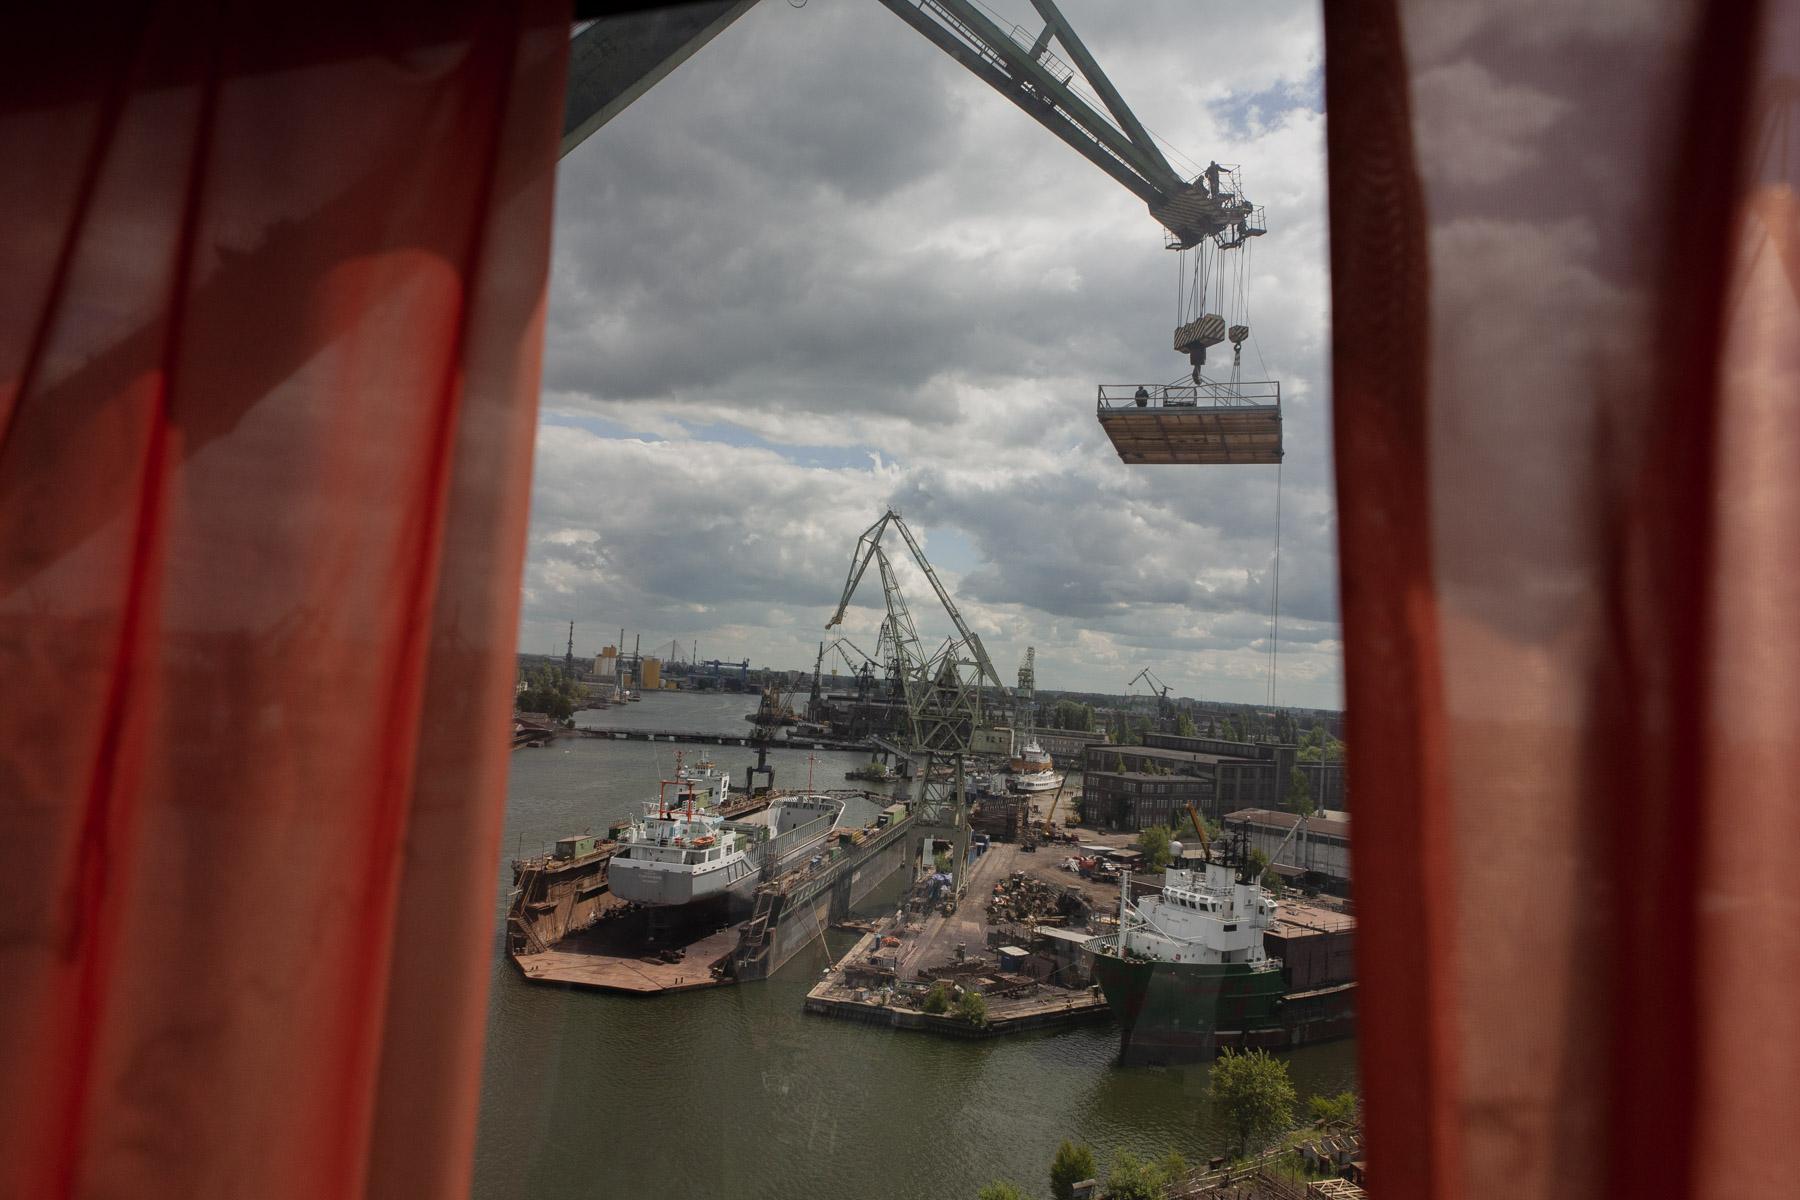 03-Gdansk-Shipyard_03_MG_2639_p-Mikolaj-Nowacki